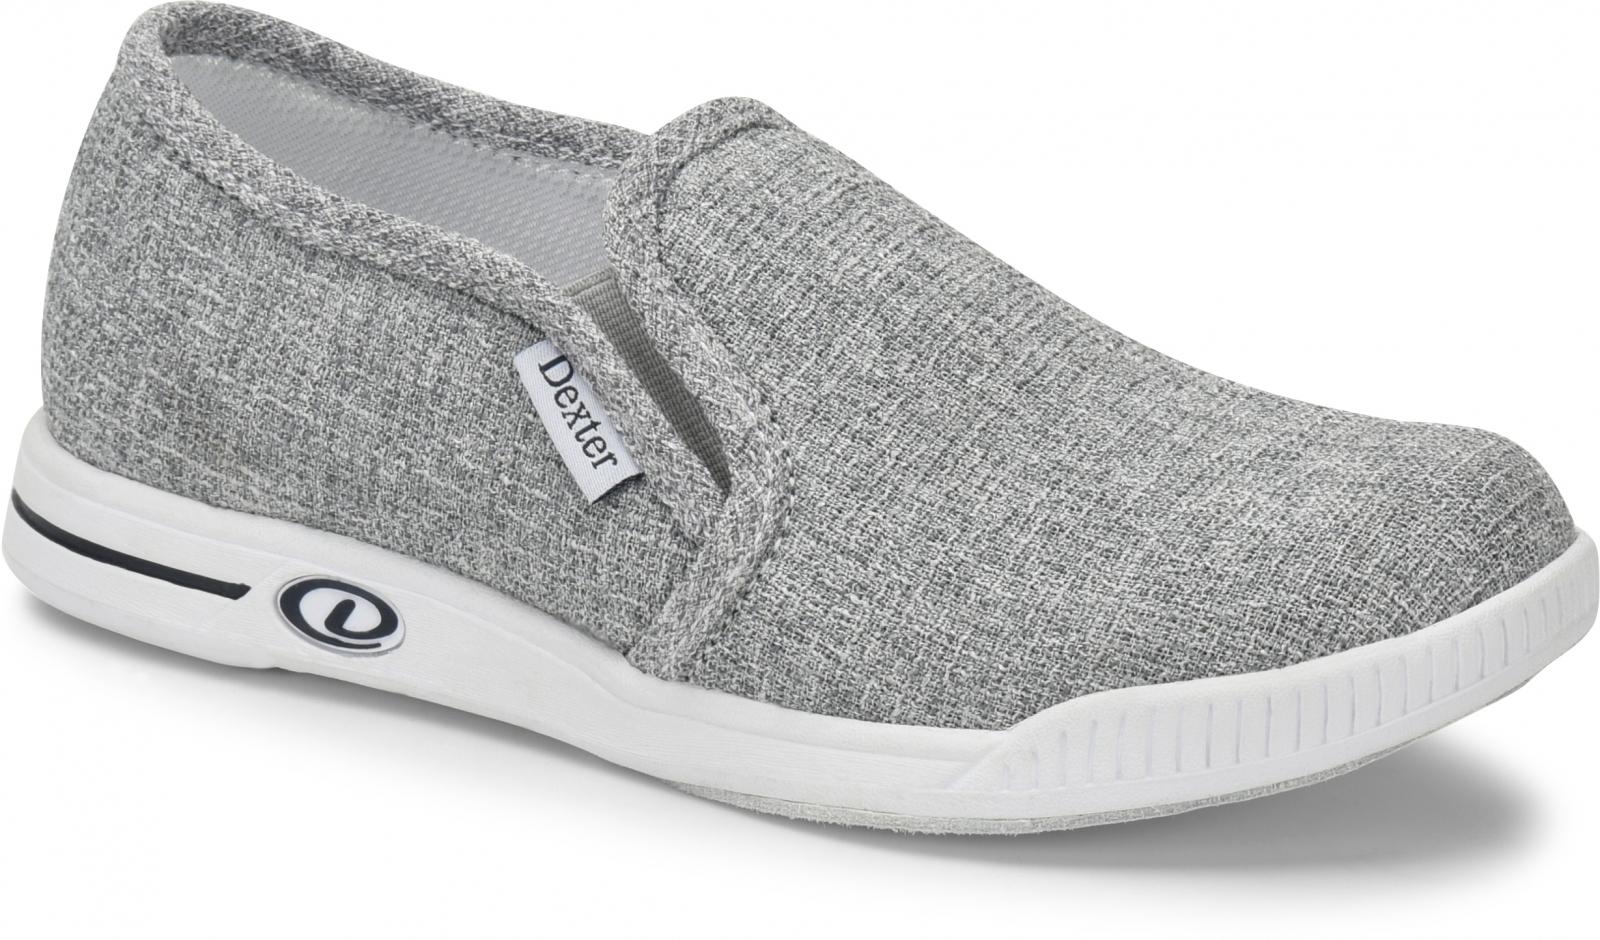 Suzana - Grey / Twill - Bowling Shoes